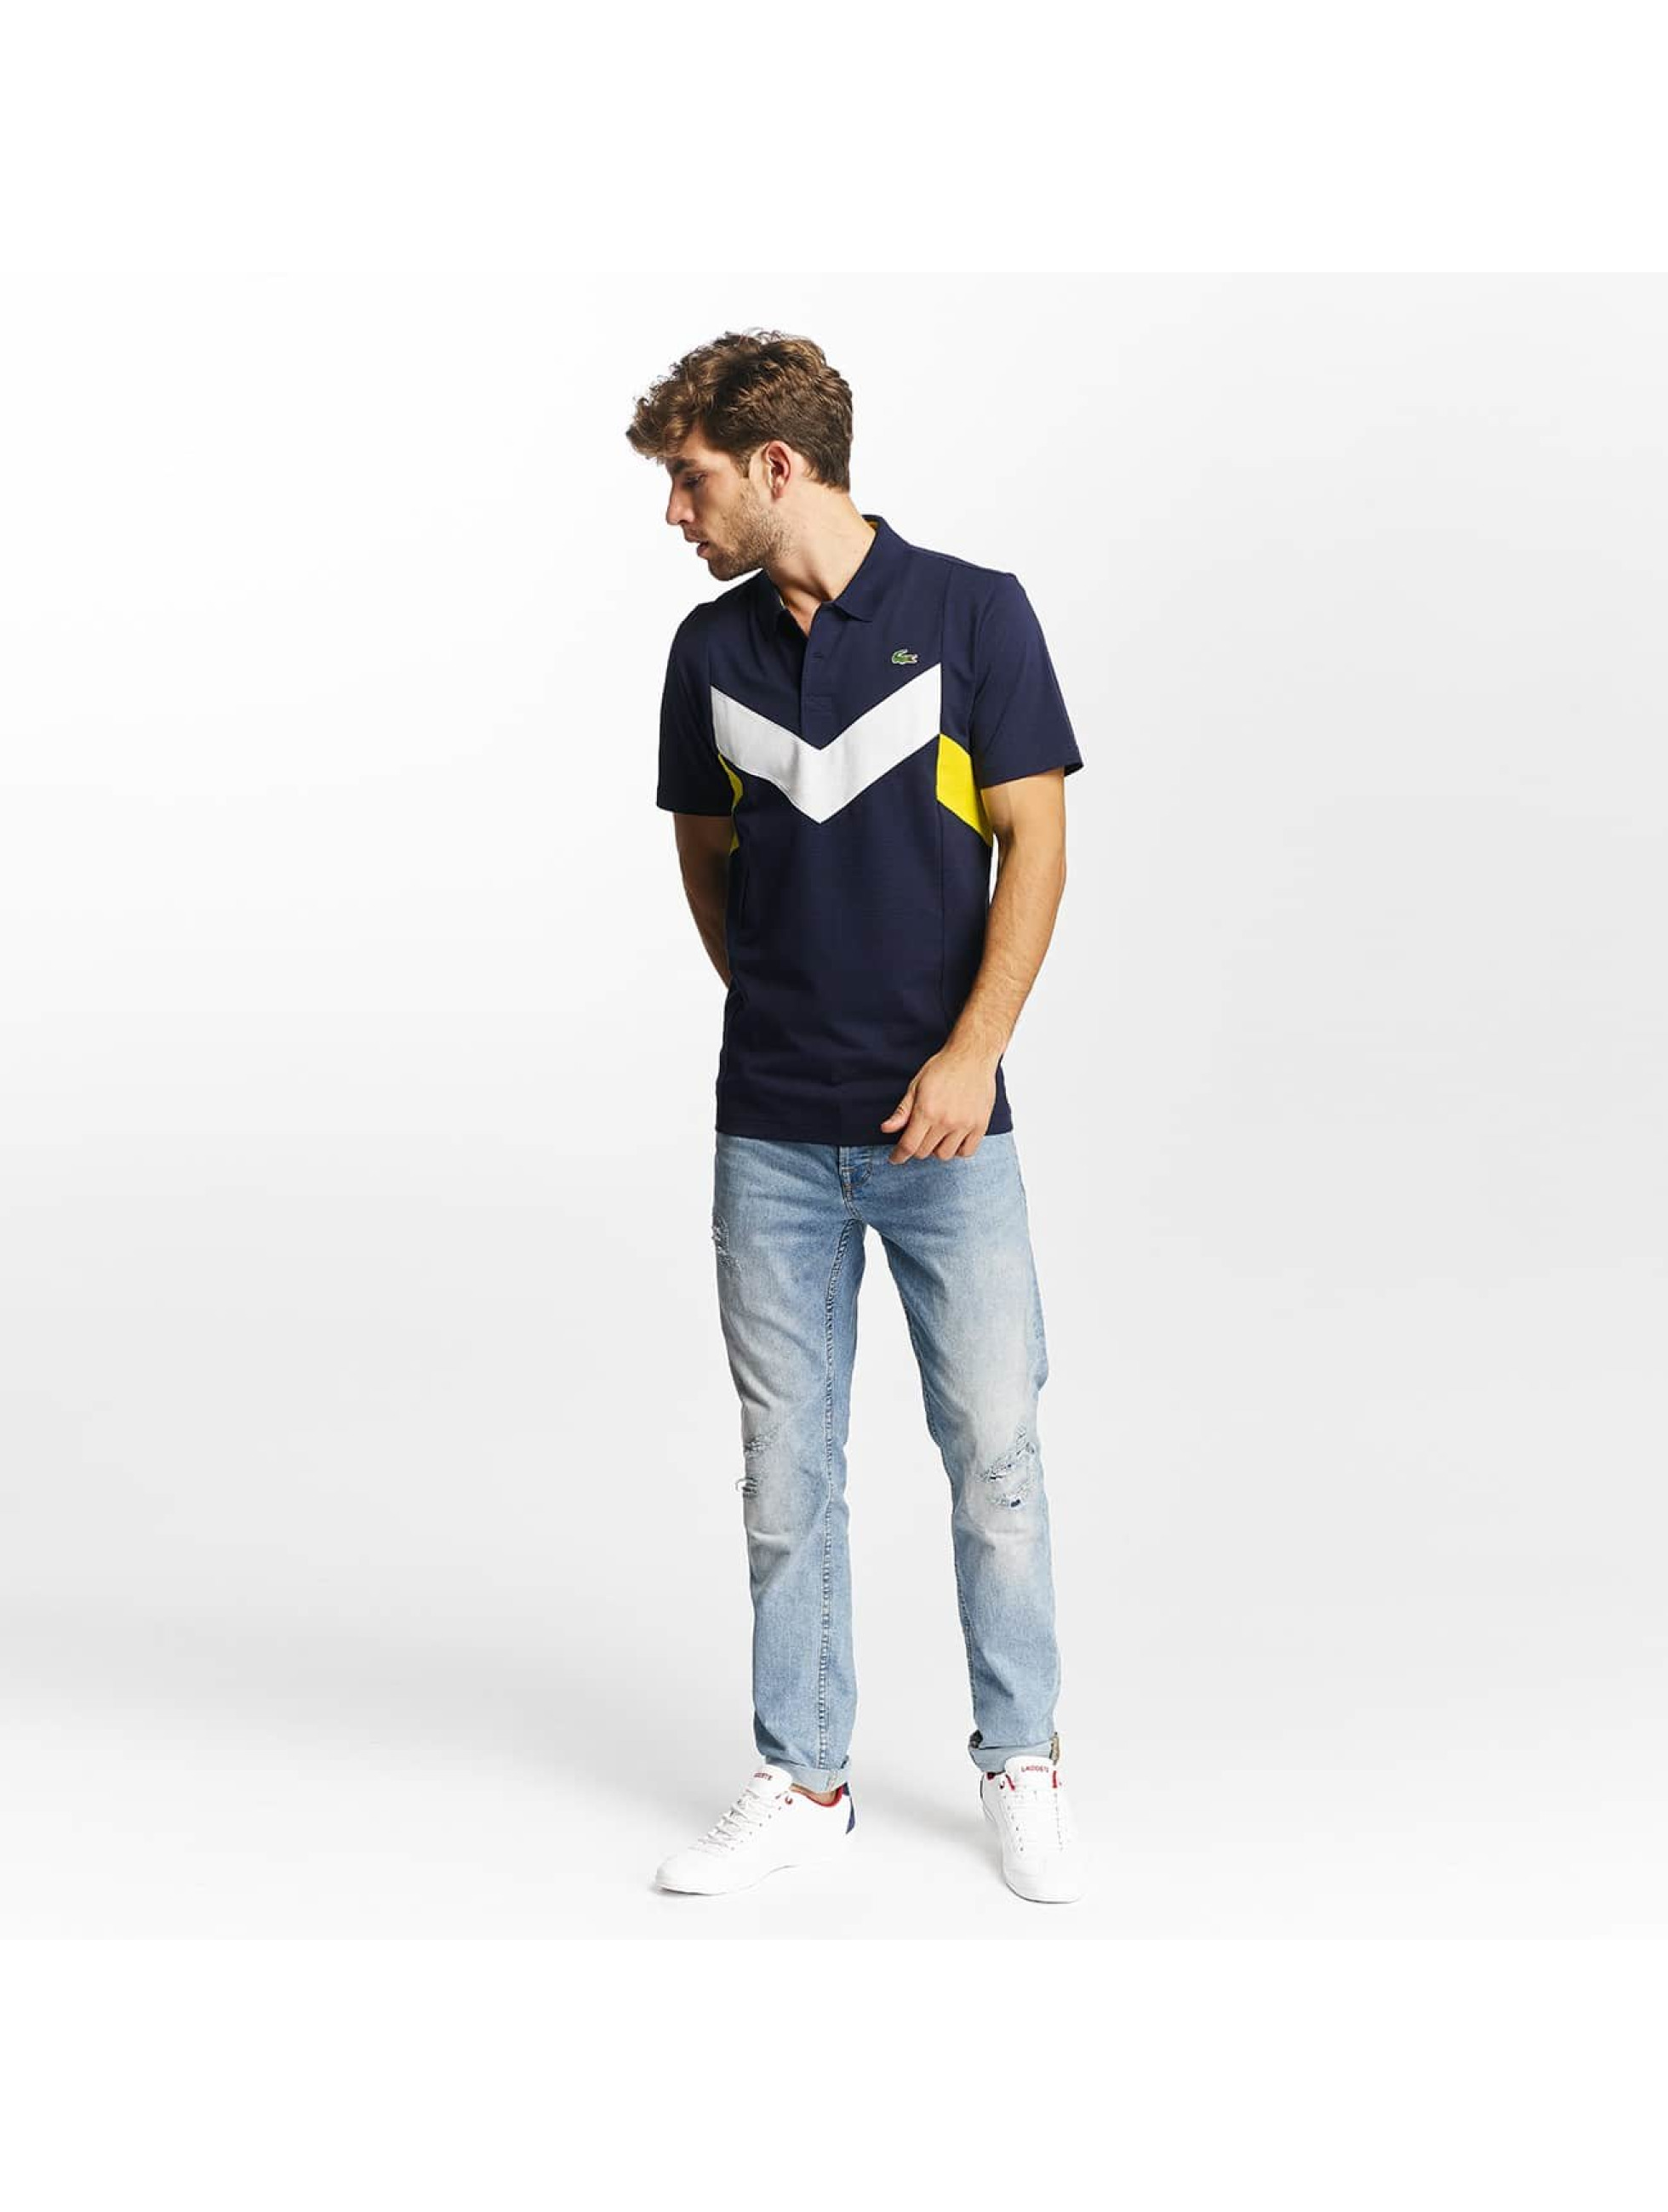 Lacoste Koszulki Polo SHort Sleeved Ribbed Collar kolorowy